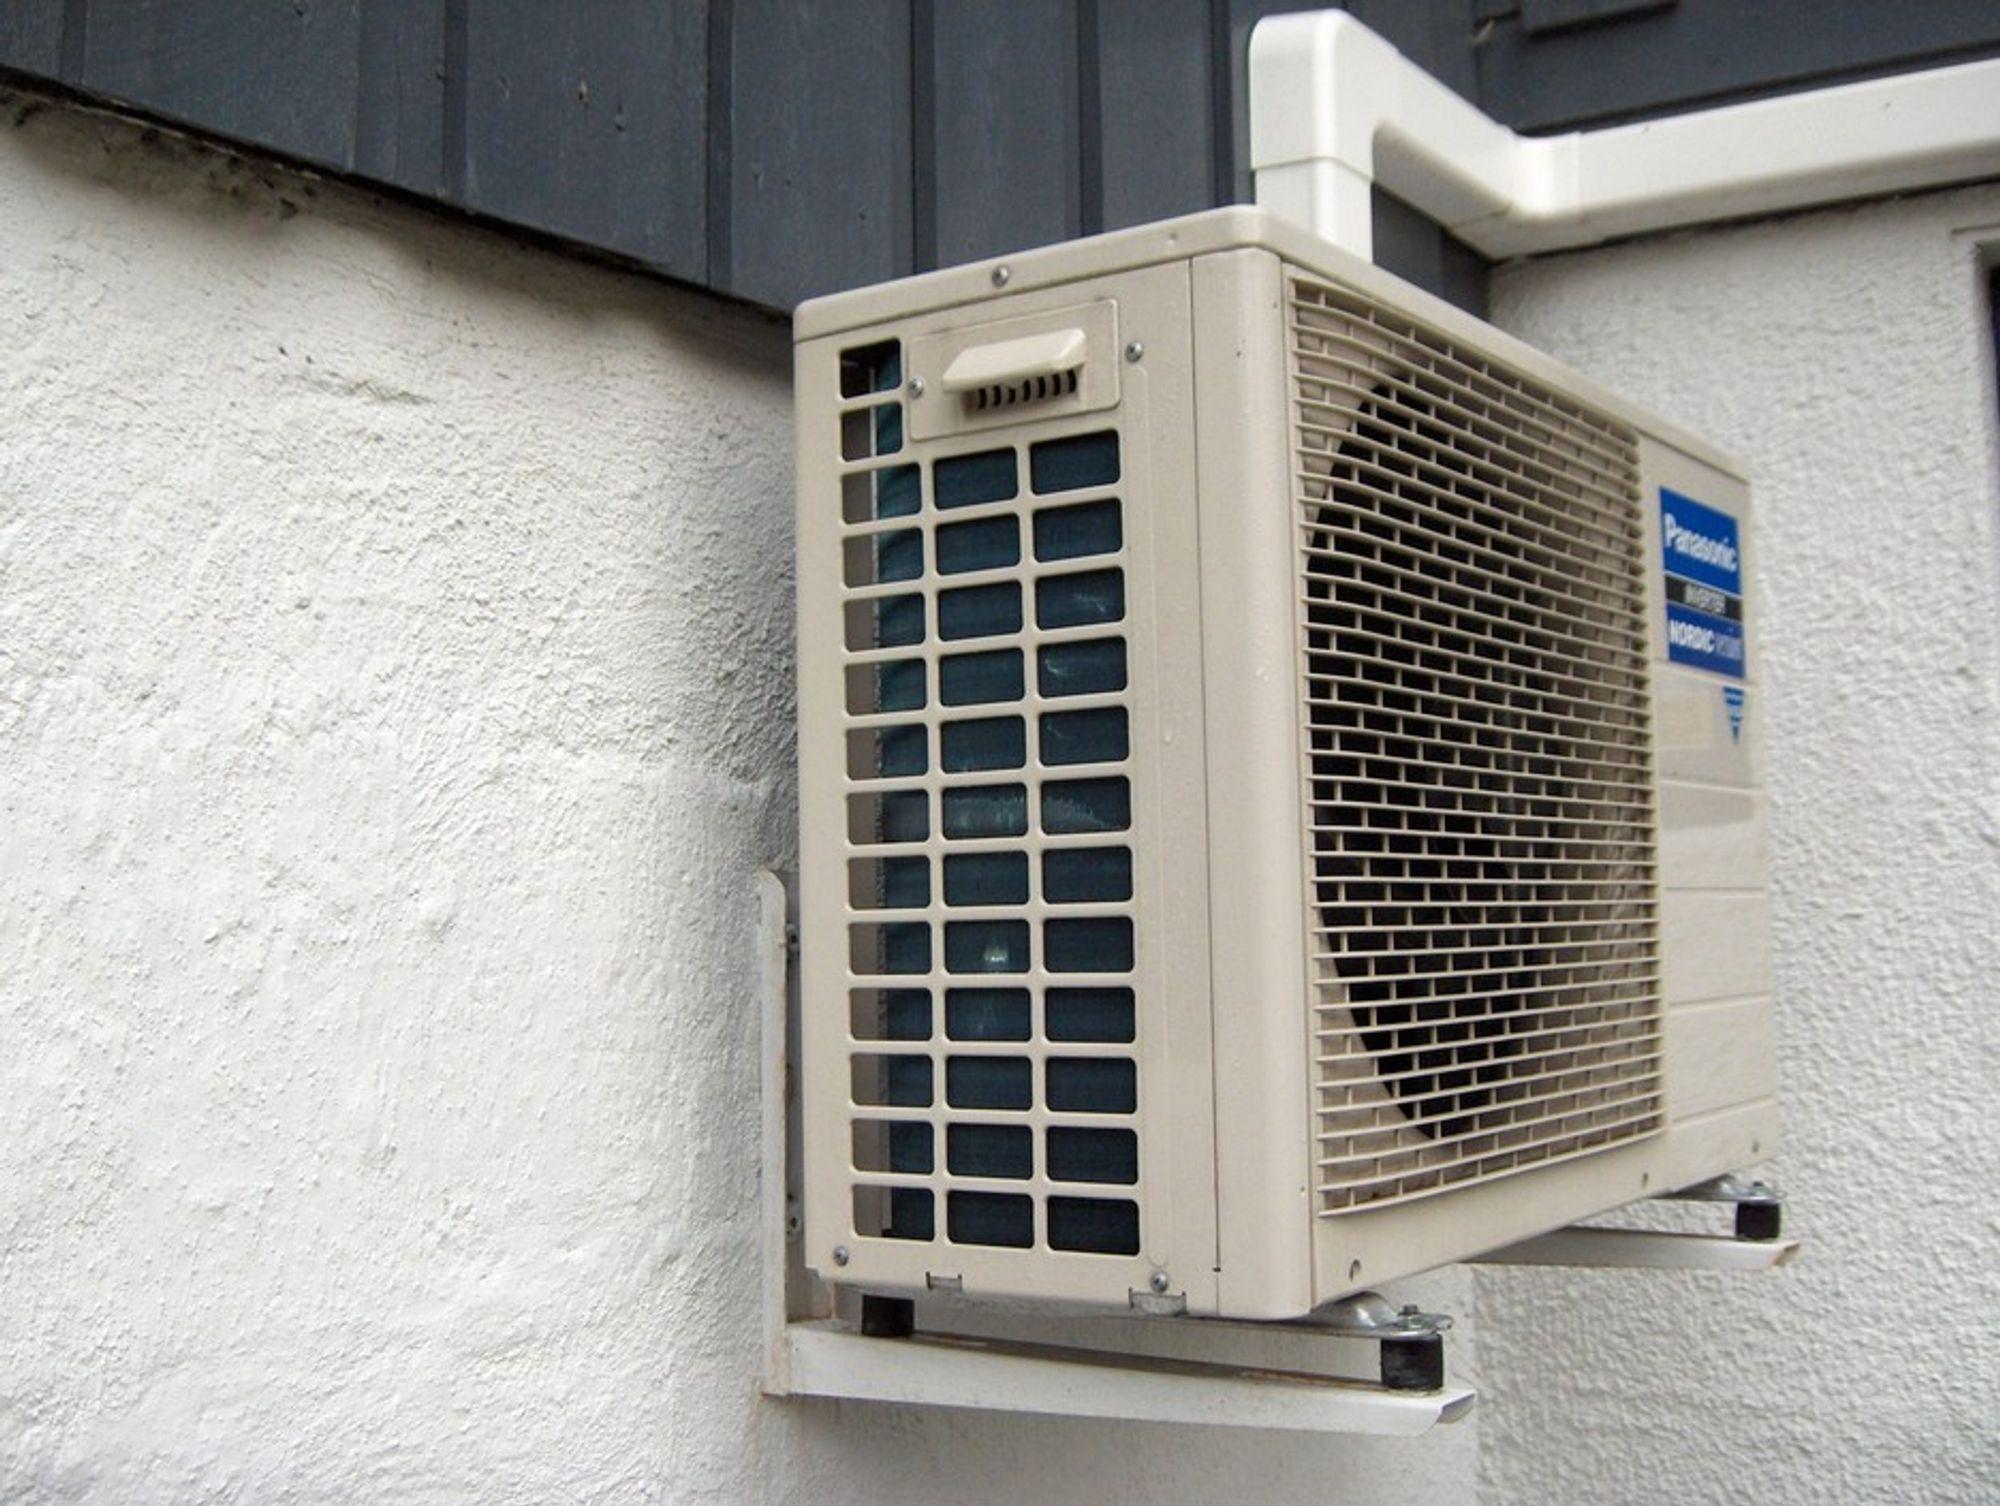 MARKANT ØKNING: Varmepumper bidrar allerede med 4TWh netto varmetilskudd i året.